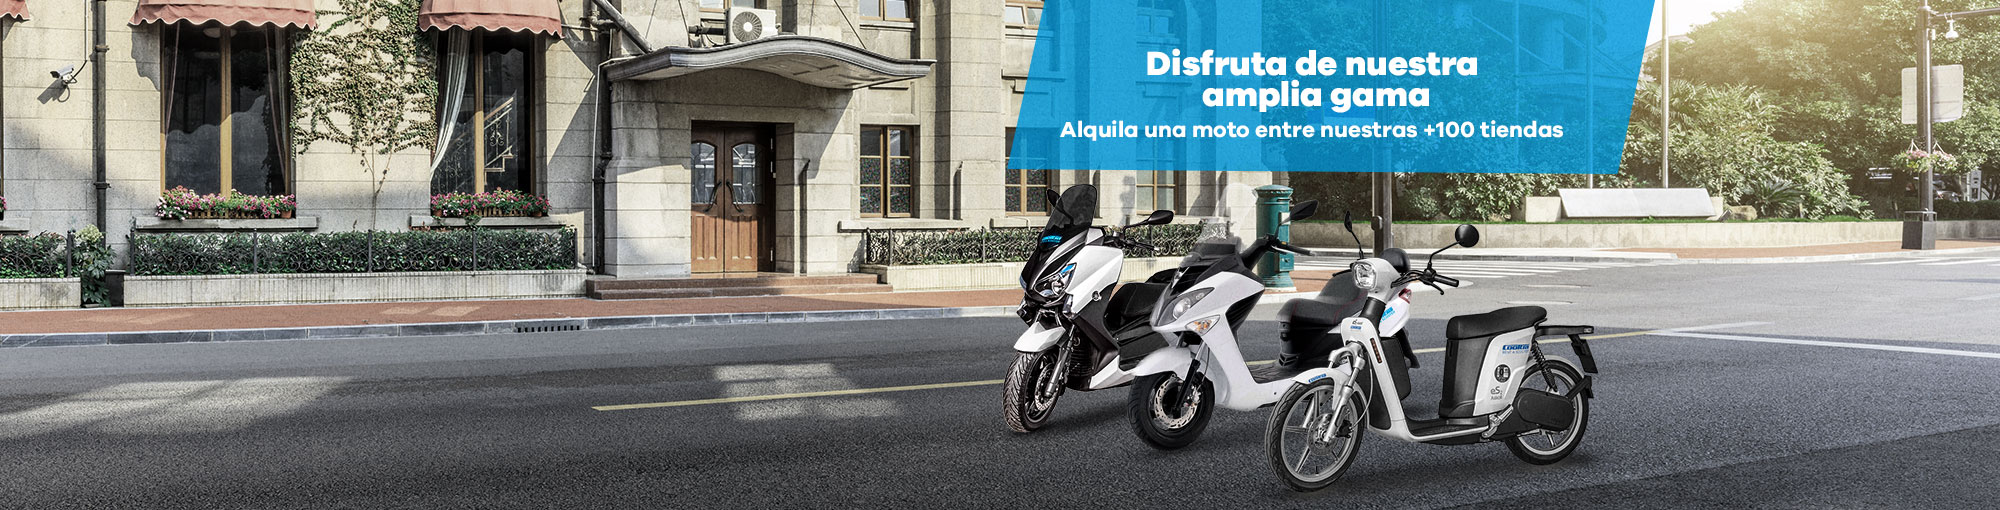 alquiler de motos grandes